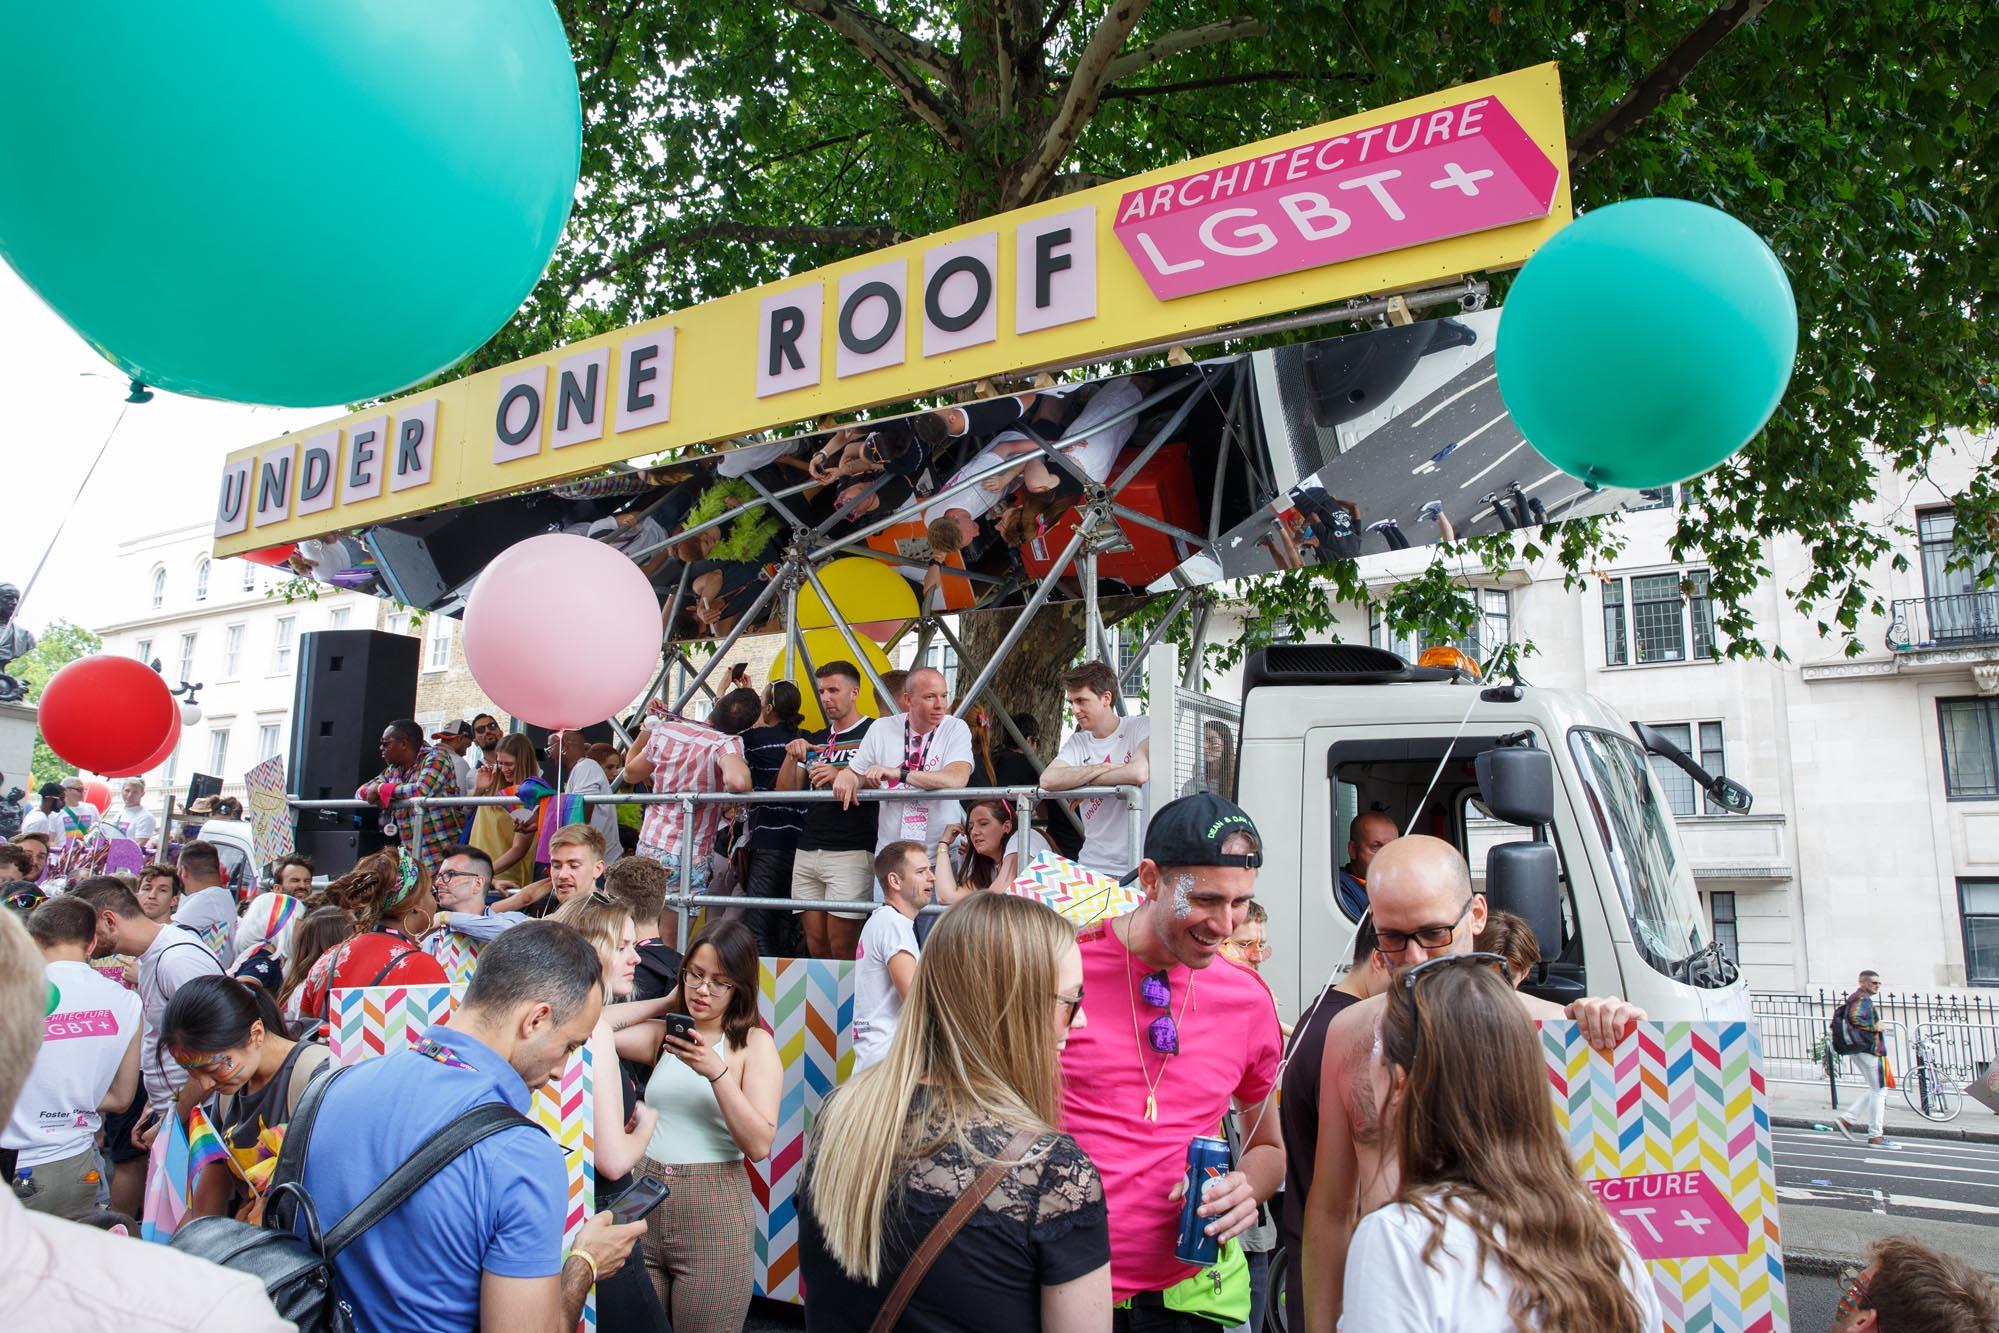 Architecture LGBT+ Pride 2019 pic Luke O'Donovan (6 of 23).jpg